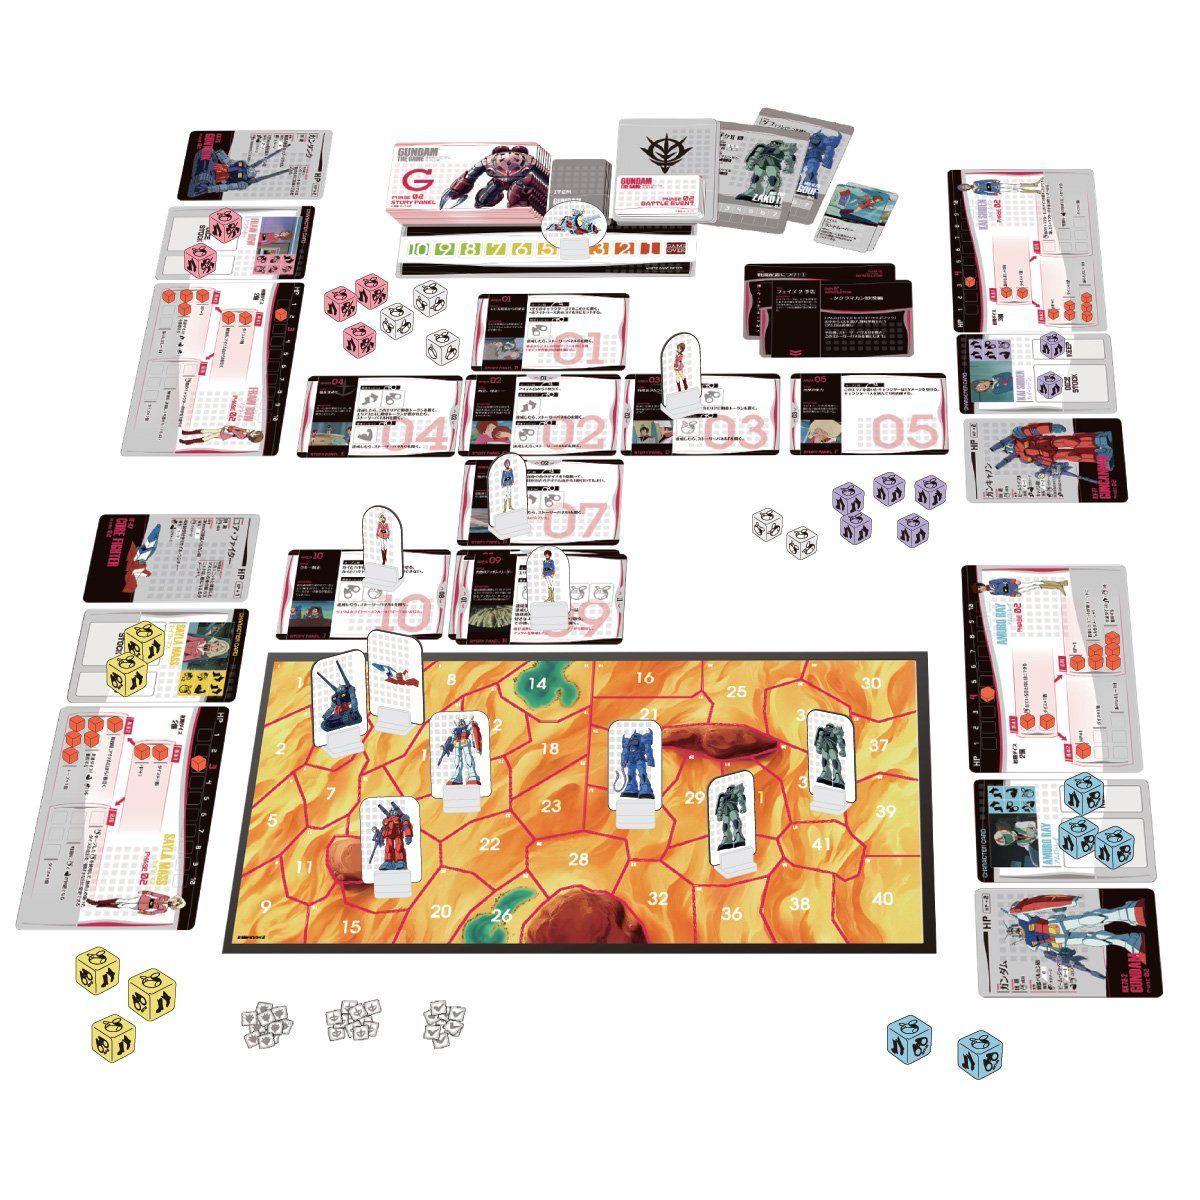 GUNDAM THE GAME『機動戦士ガンダム:哀・戦士編』ボードゲーム-001